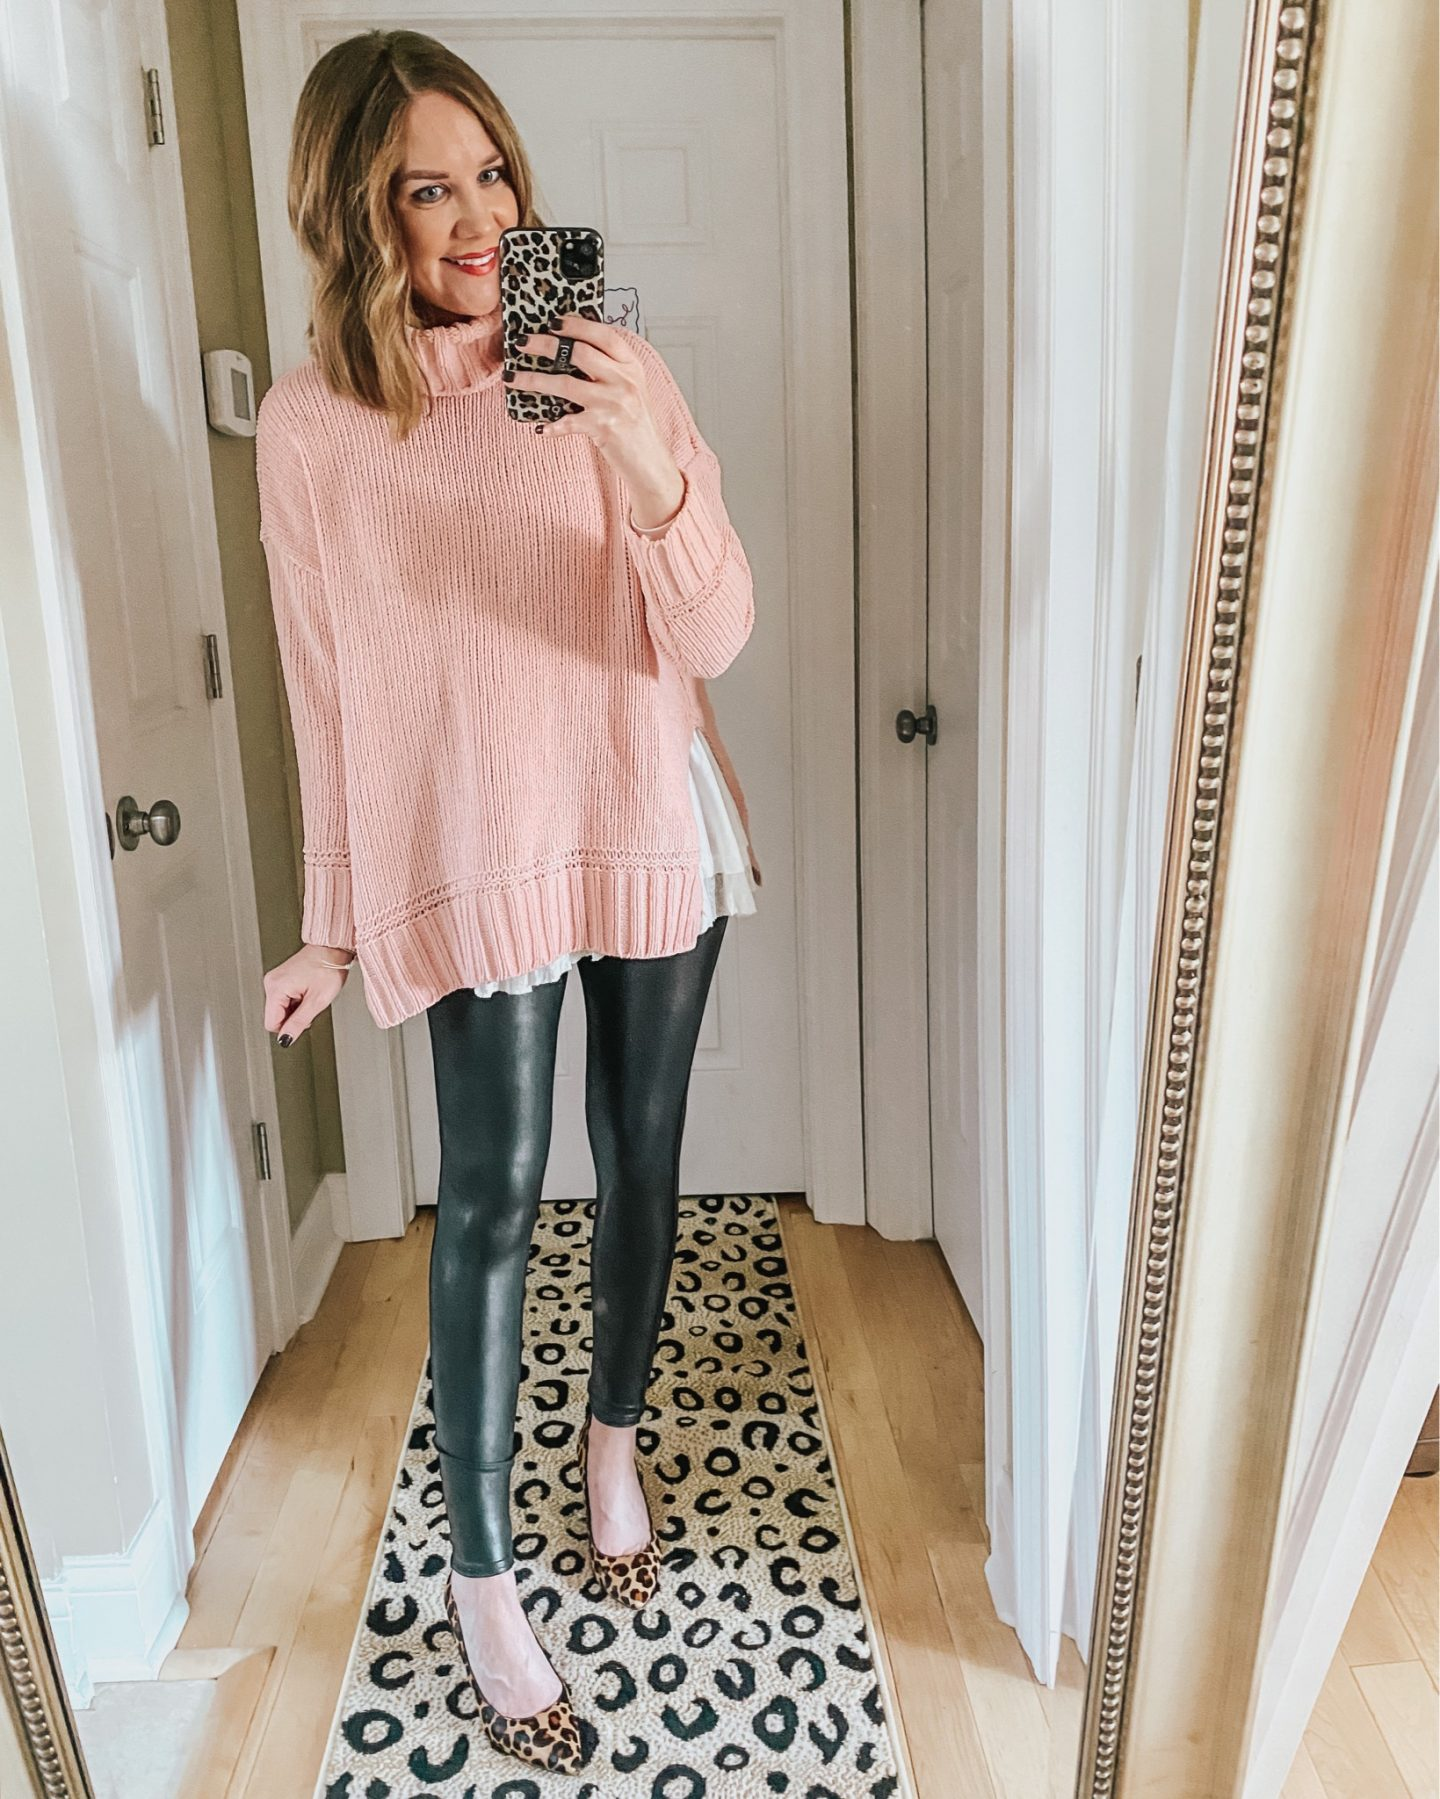 dressy-leggings-outfit